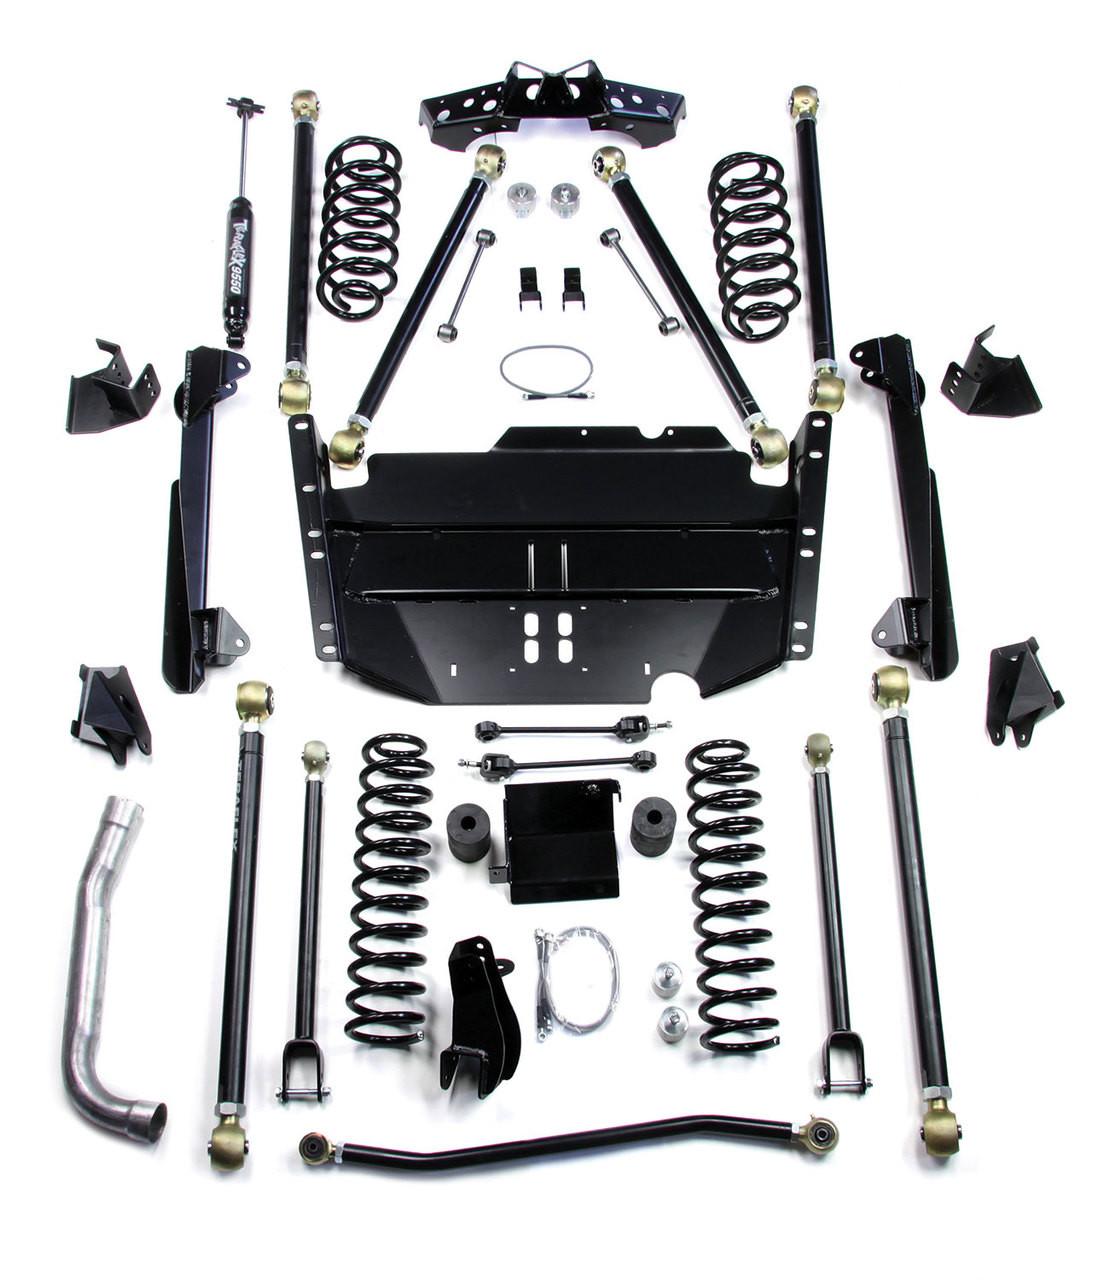 "TeraFlex 1449575 5"" Pro LCG Long FlexArm Lift Kit for Jeep Wrangler TJ 1997-2006"